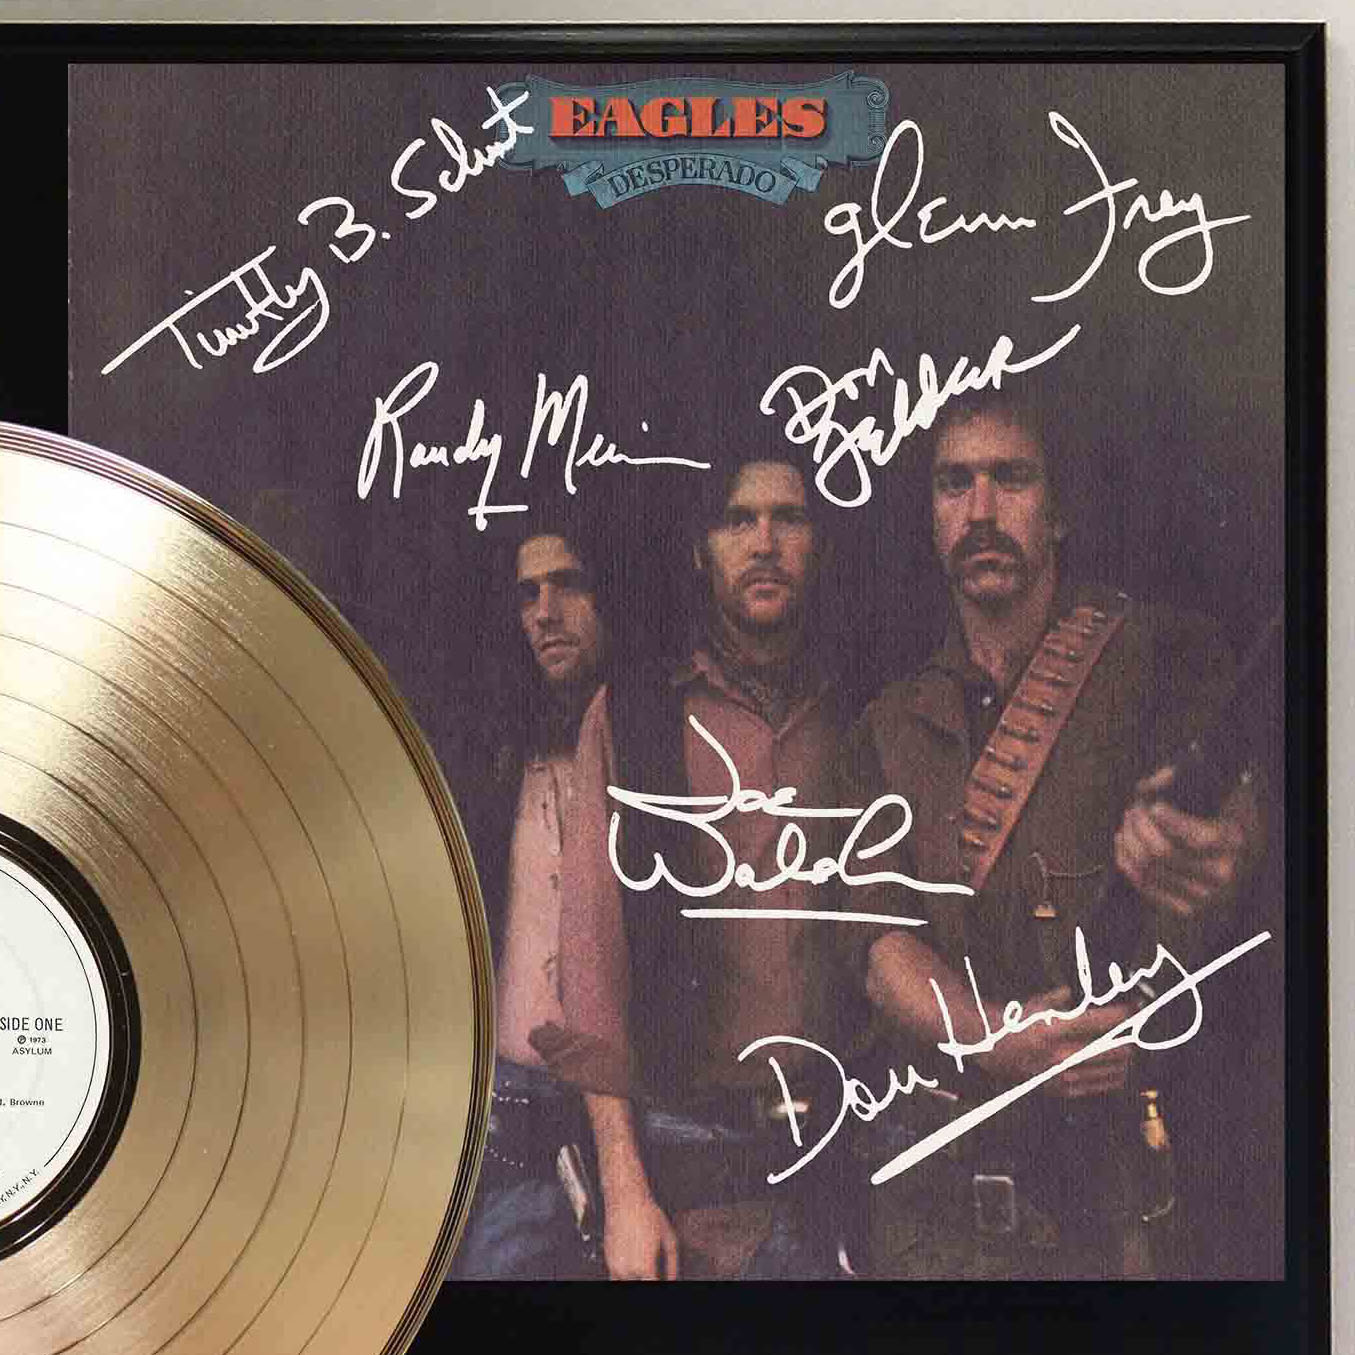 Eagles Desperado Gold Lp Record Signature Display C3 Gold Record Outlet Album And Disc Collectible Memorabilia